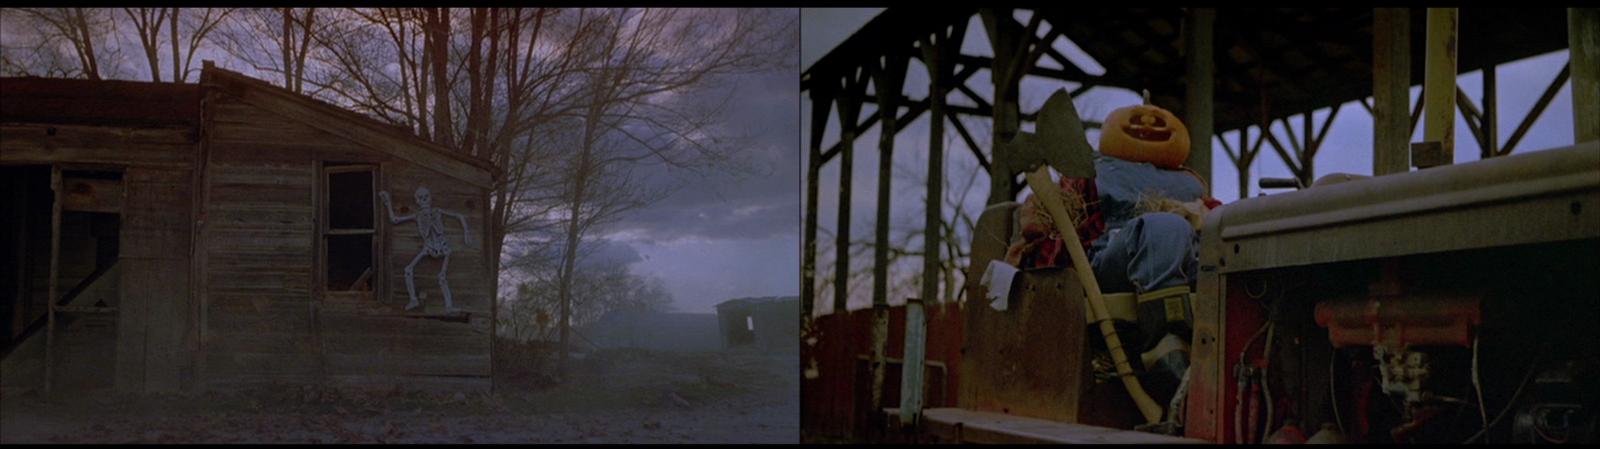 life between frames film appreciation haddonfield part ii - Michael Myers Halloween Decorations